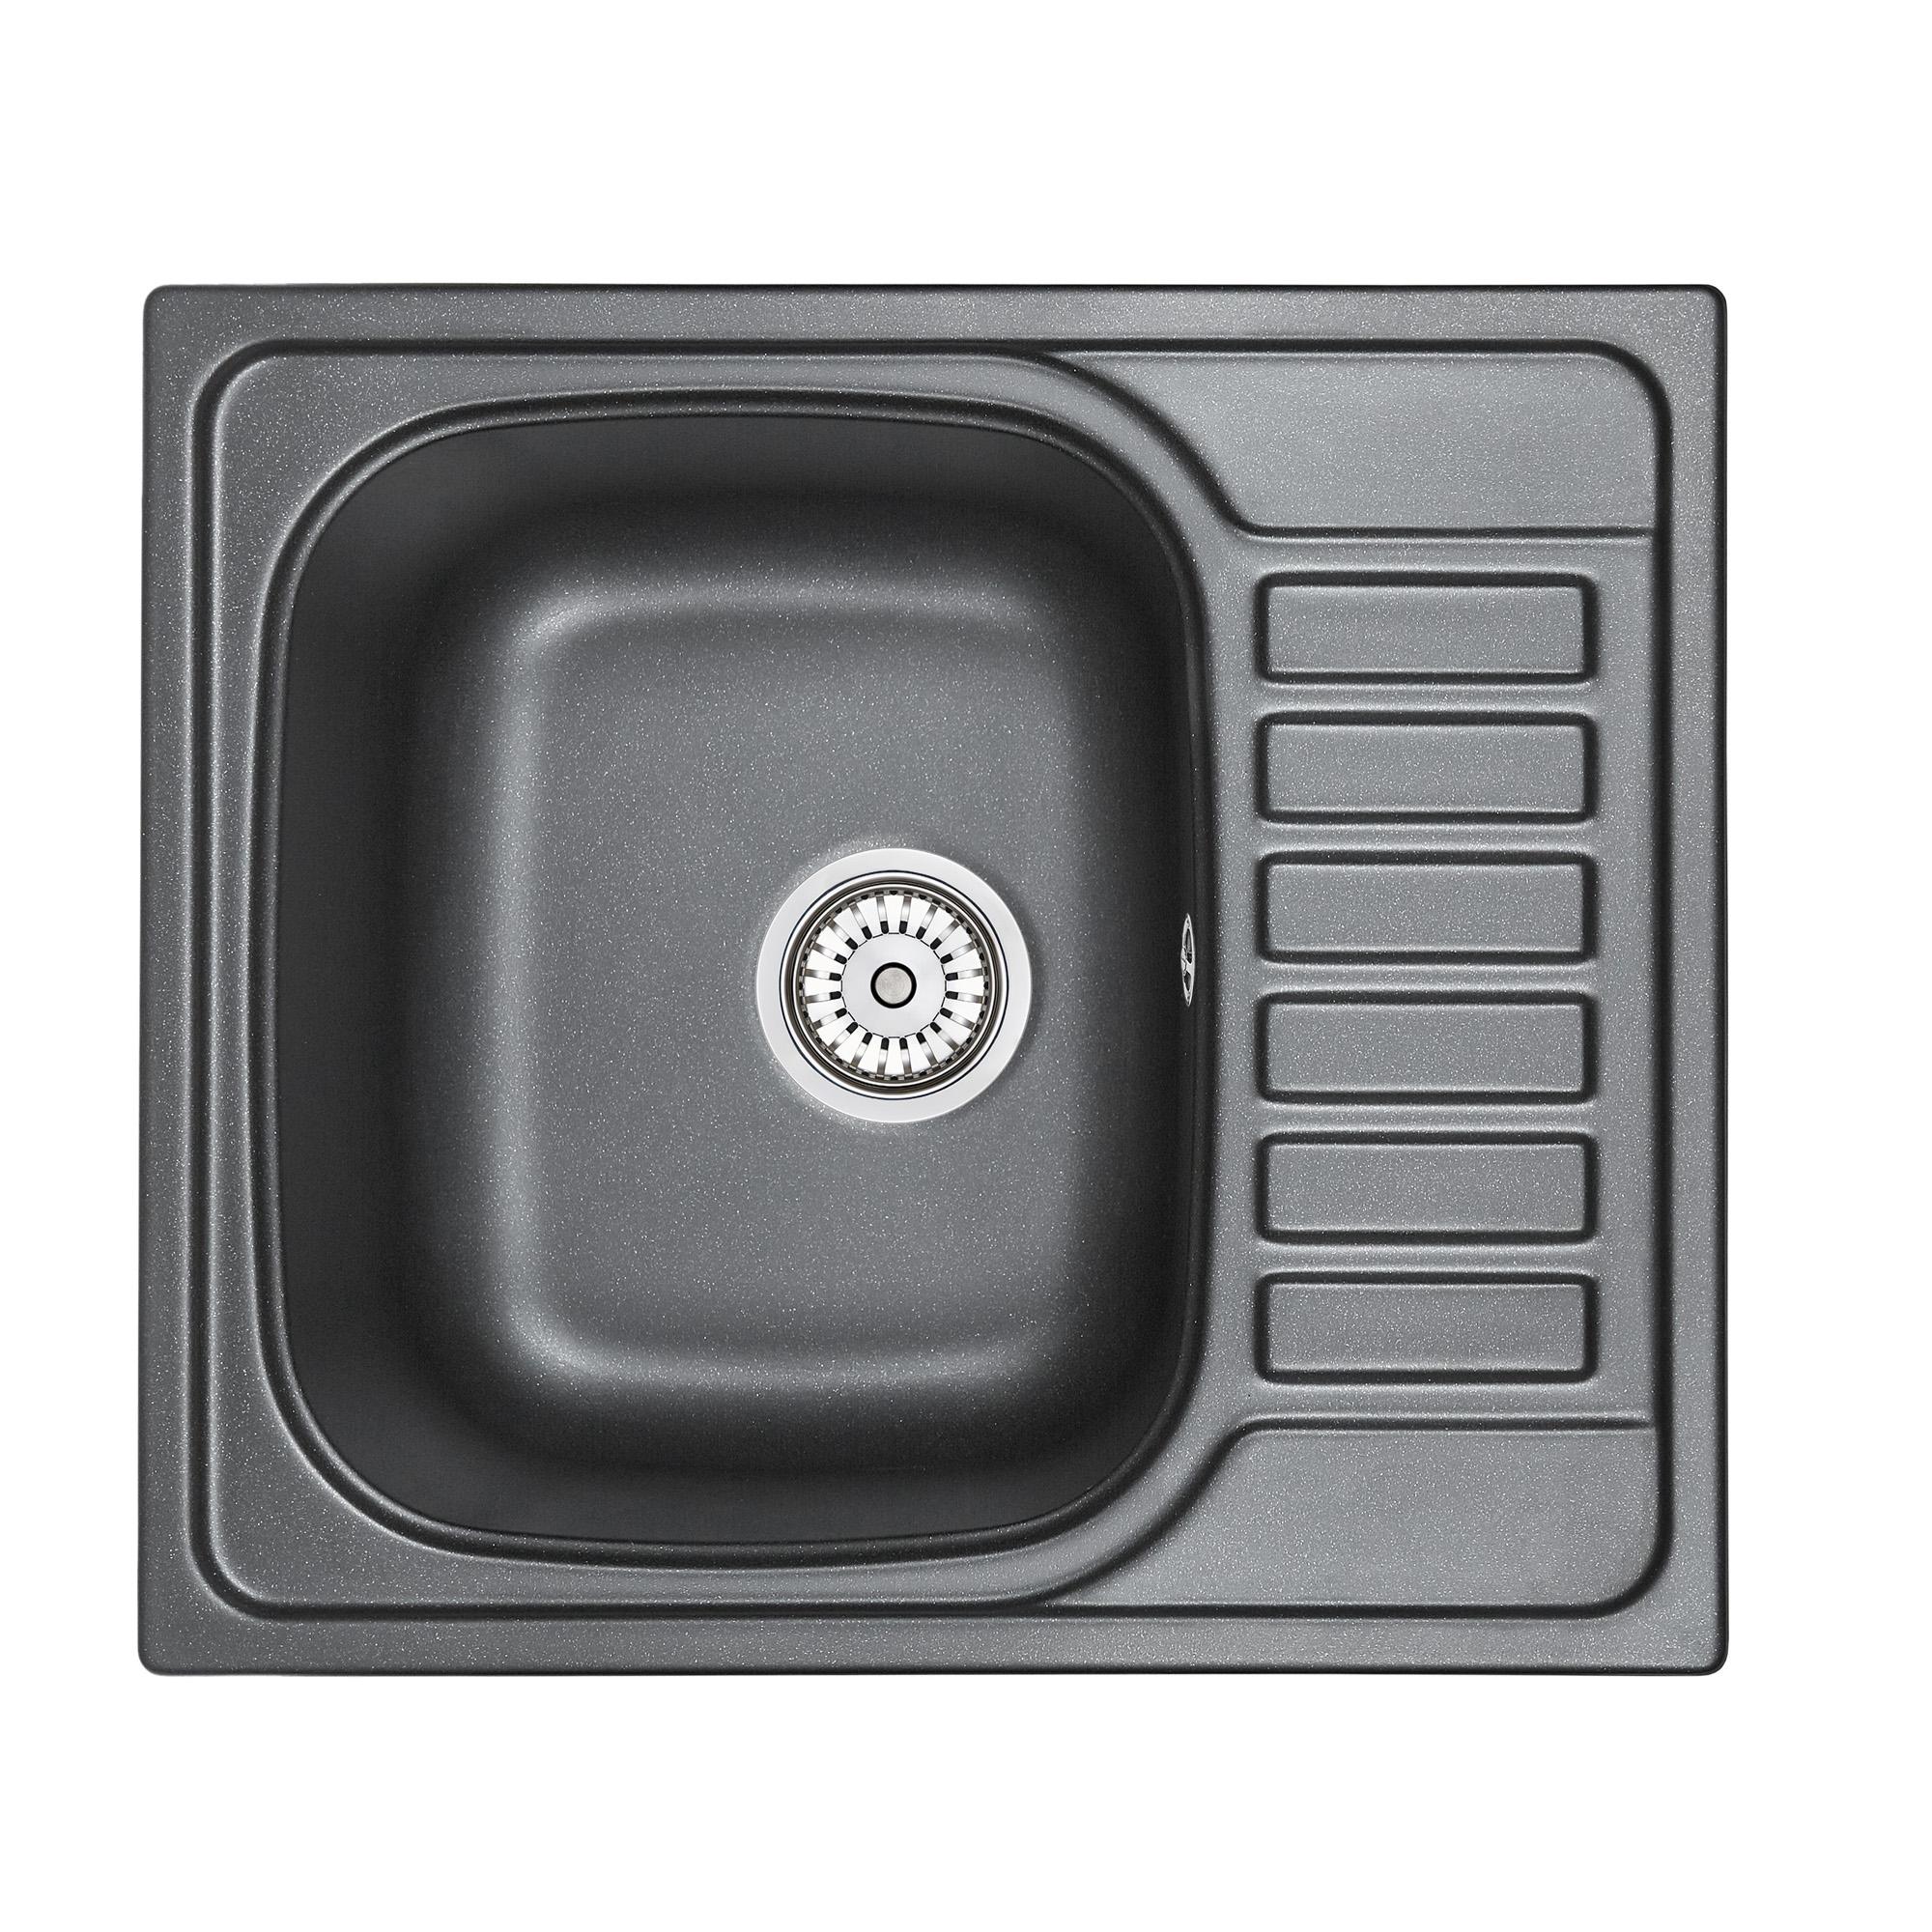 Кухонная мойка Granula GR-5801 575х495 шварц кухонная мойка teka classic 1b 1 2d microtex